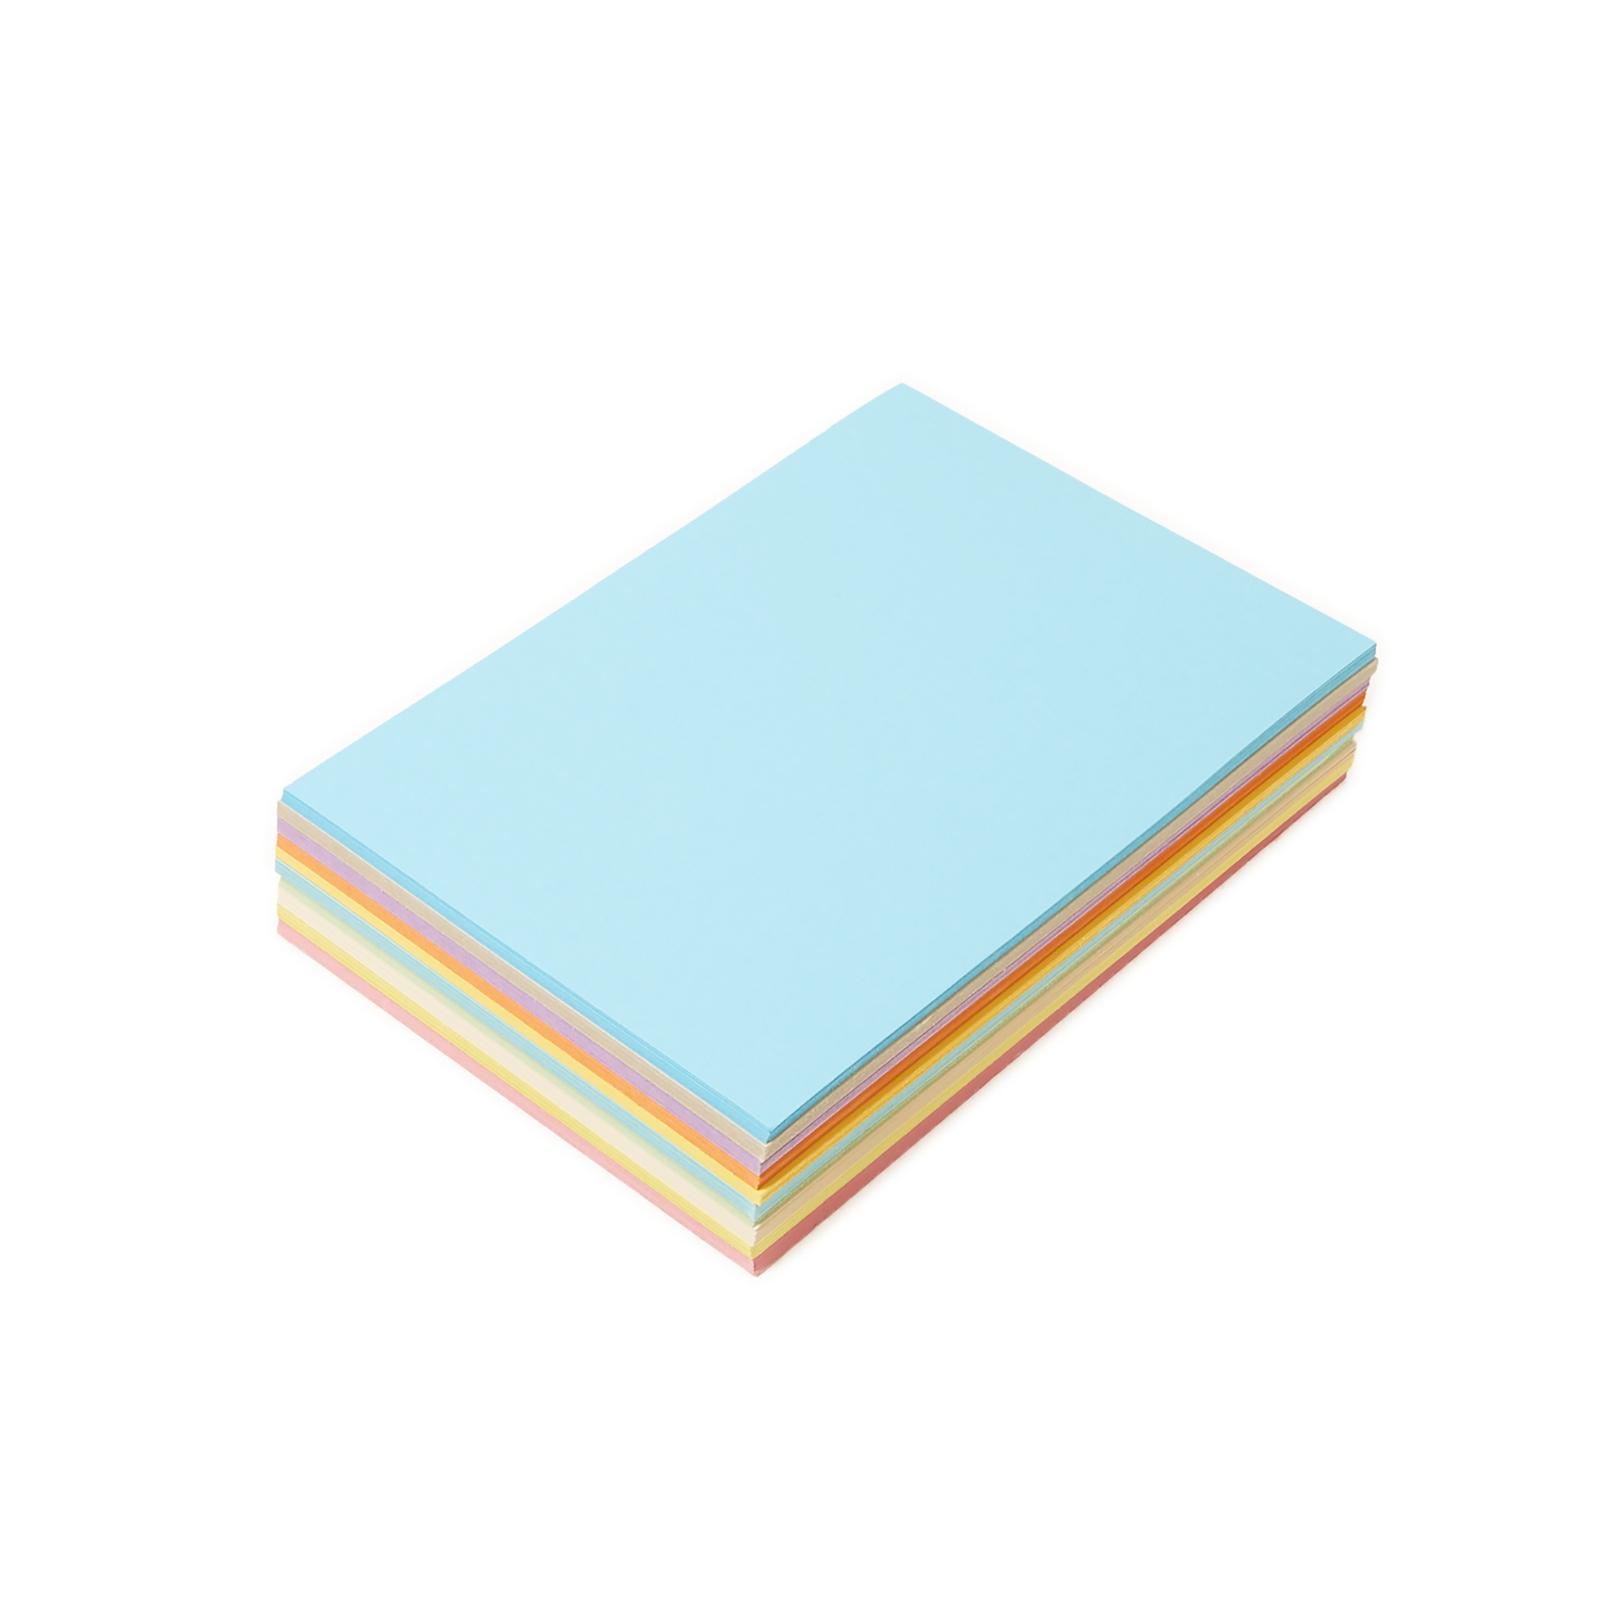 Classmates Budget Card - A4